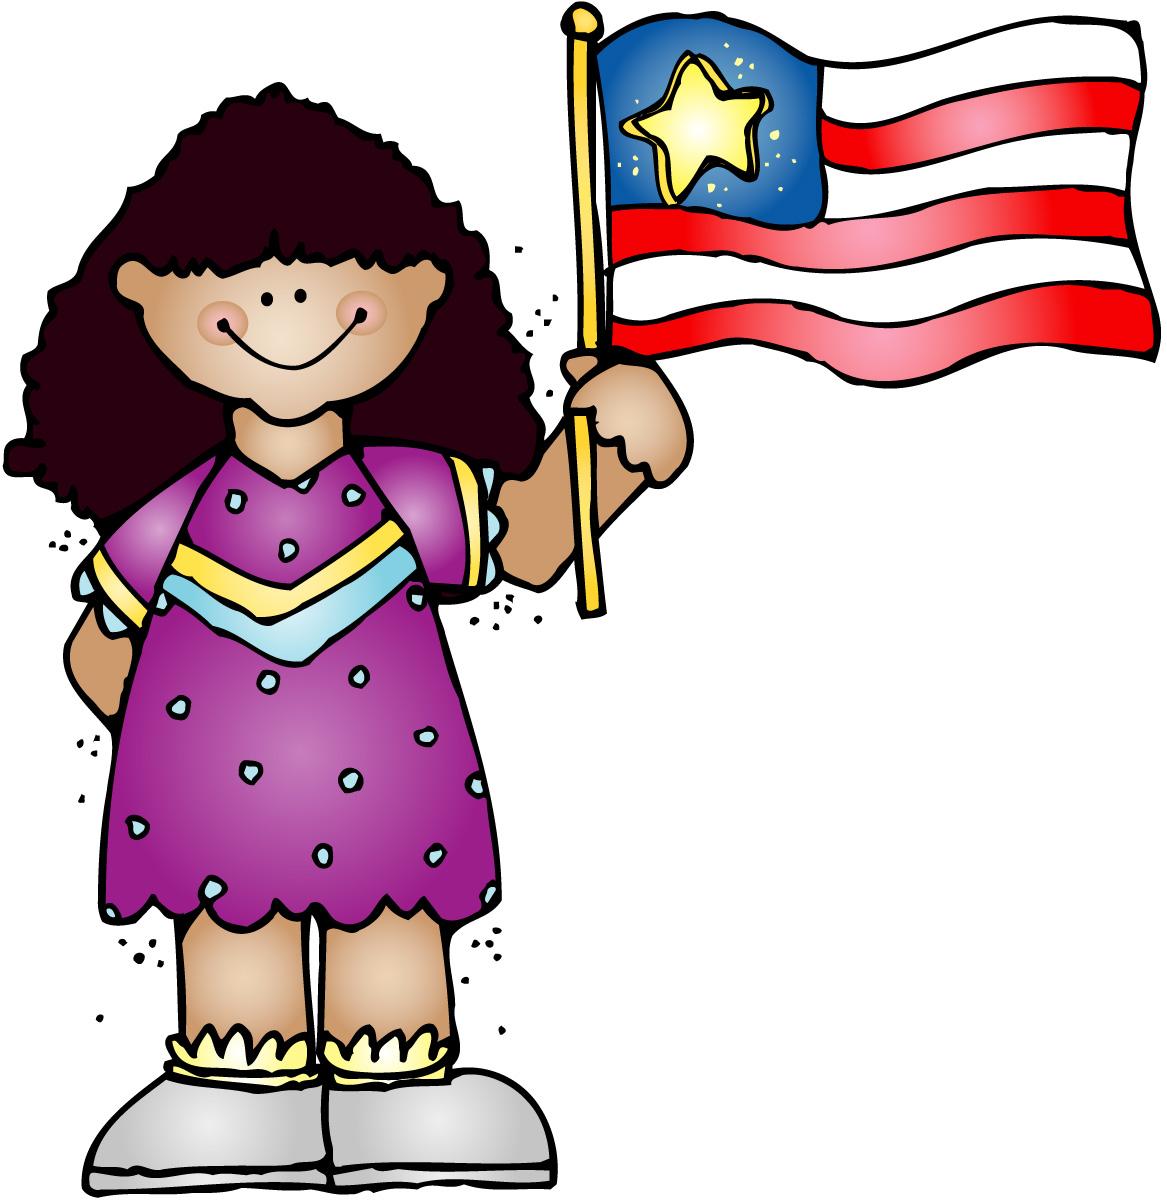 mrs ayala s kinder fun freedom week constitution day rh mrsayalaskinderfun blogspot com Freedom Illustrations Freedom Illustrations